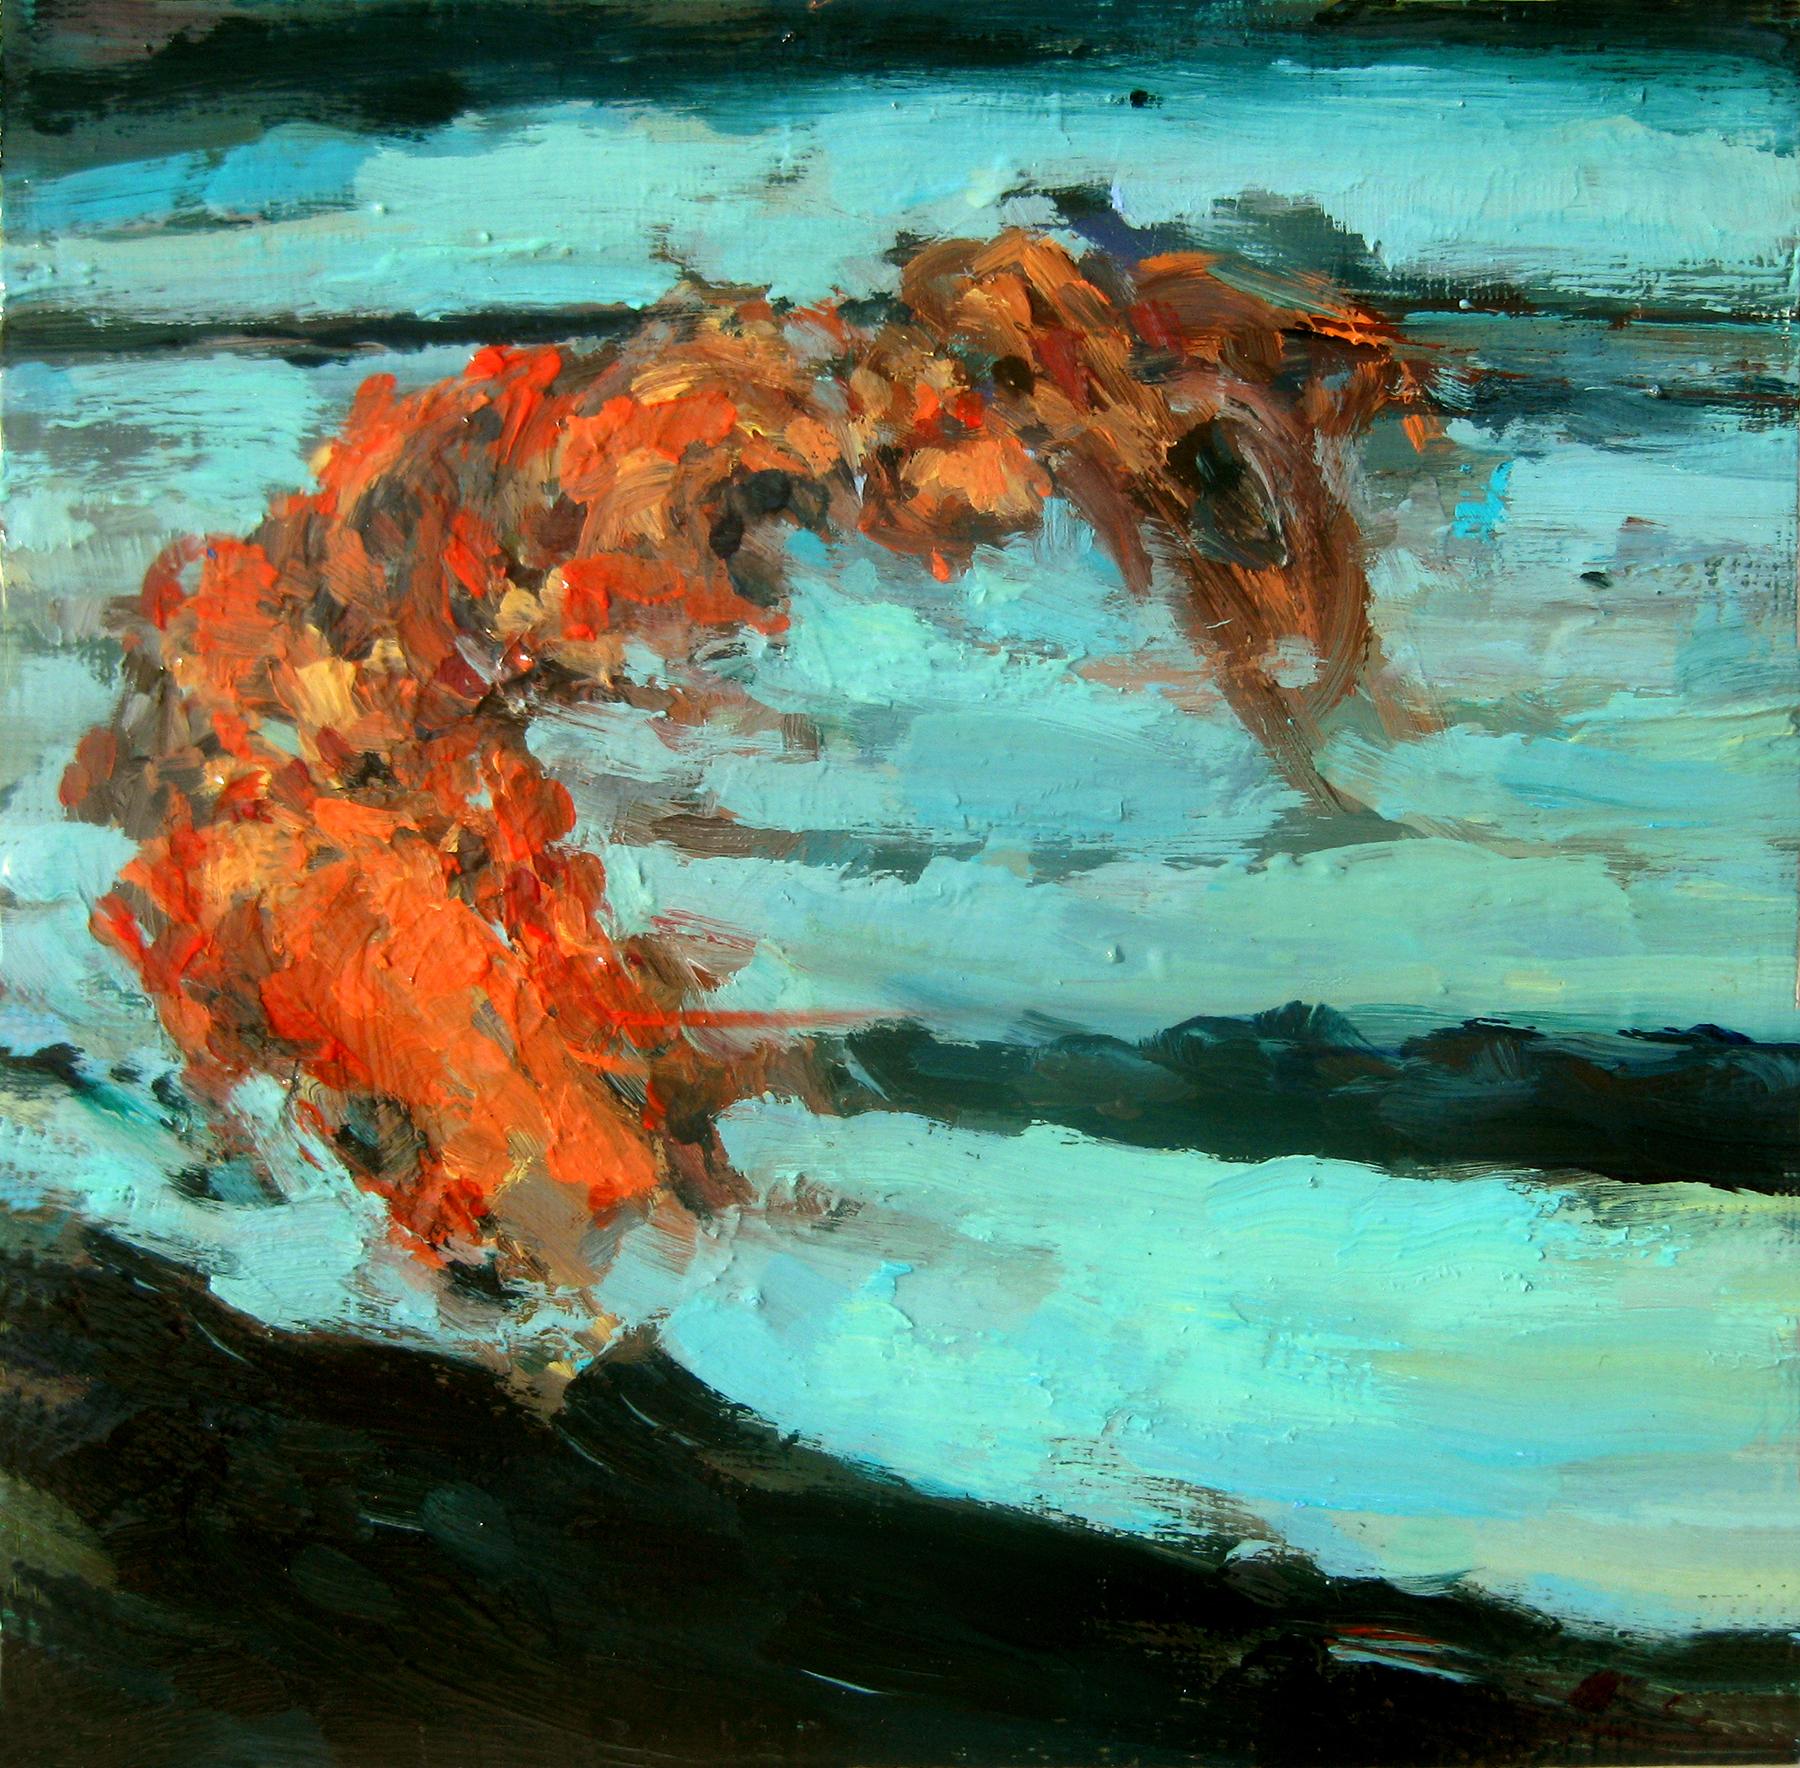 "Undertow, oil on board, 8"" x 8"", 2011"